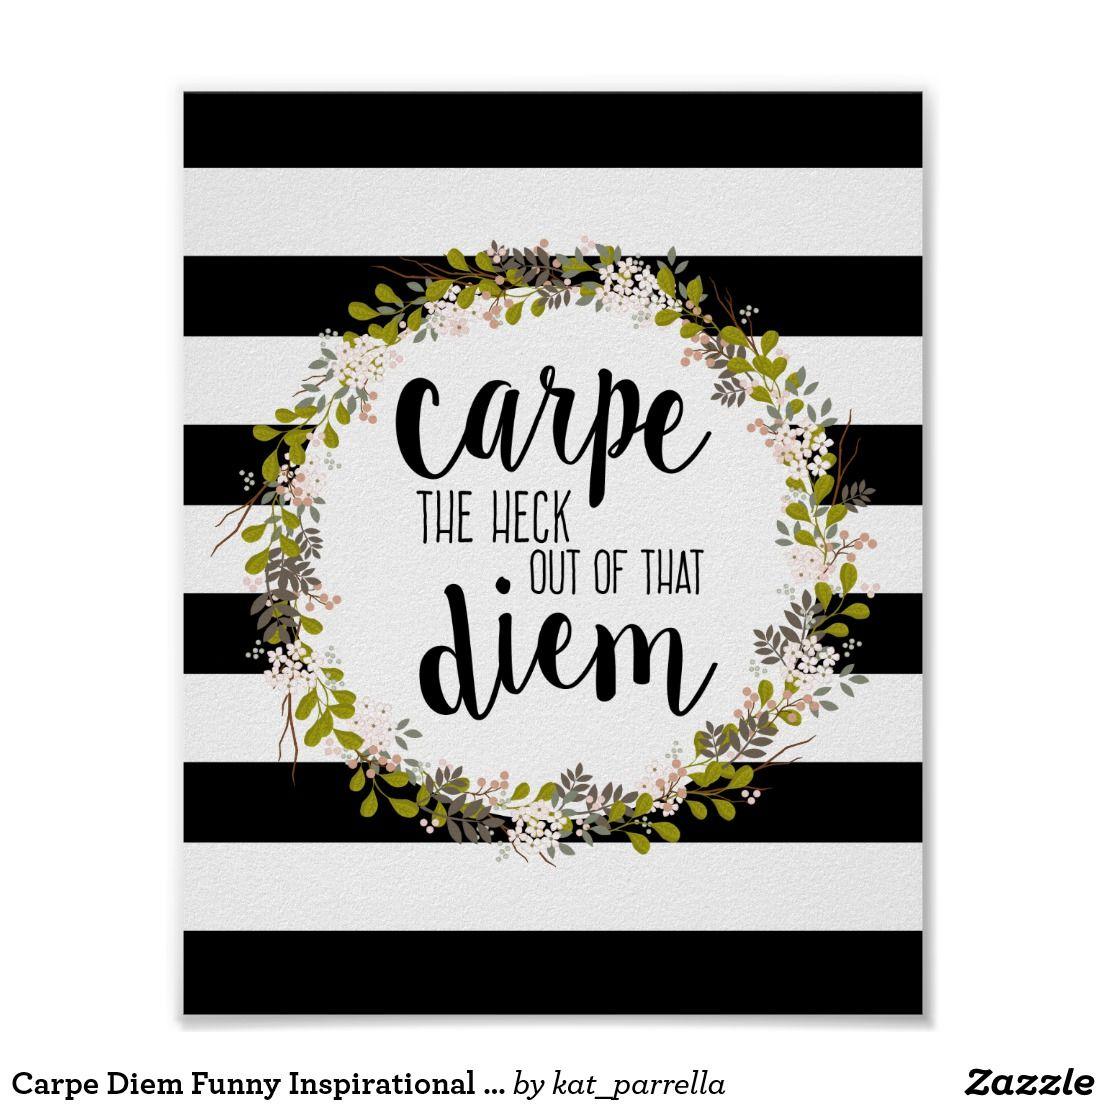 Carpe Diem Funny Inspirational Quote Art Print Funny Inspirational Quotes Wall Art Quotes Quote Posters